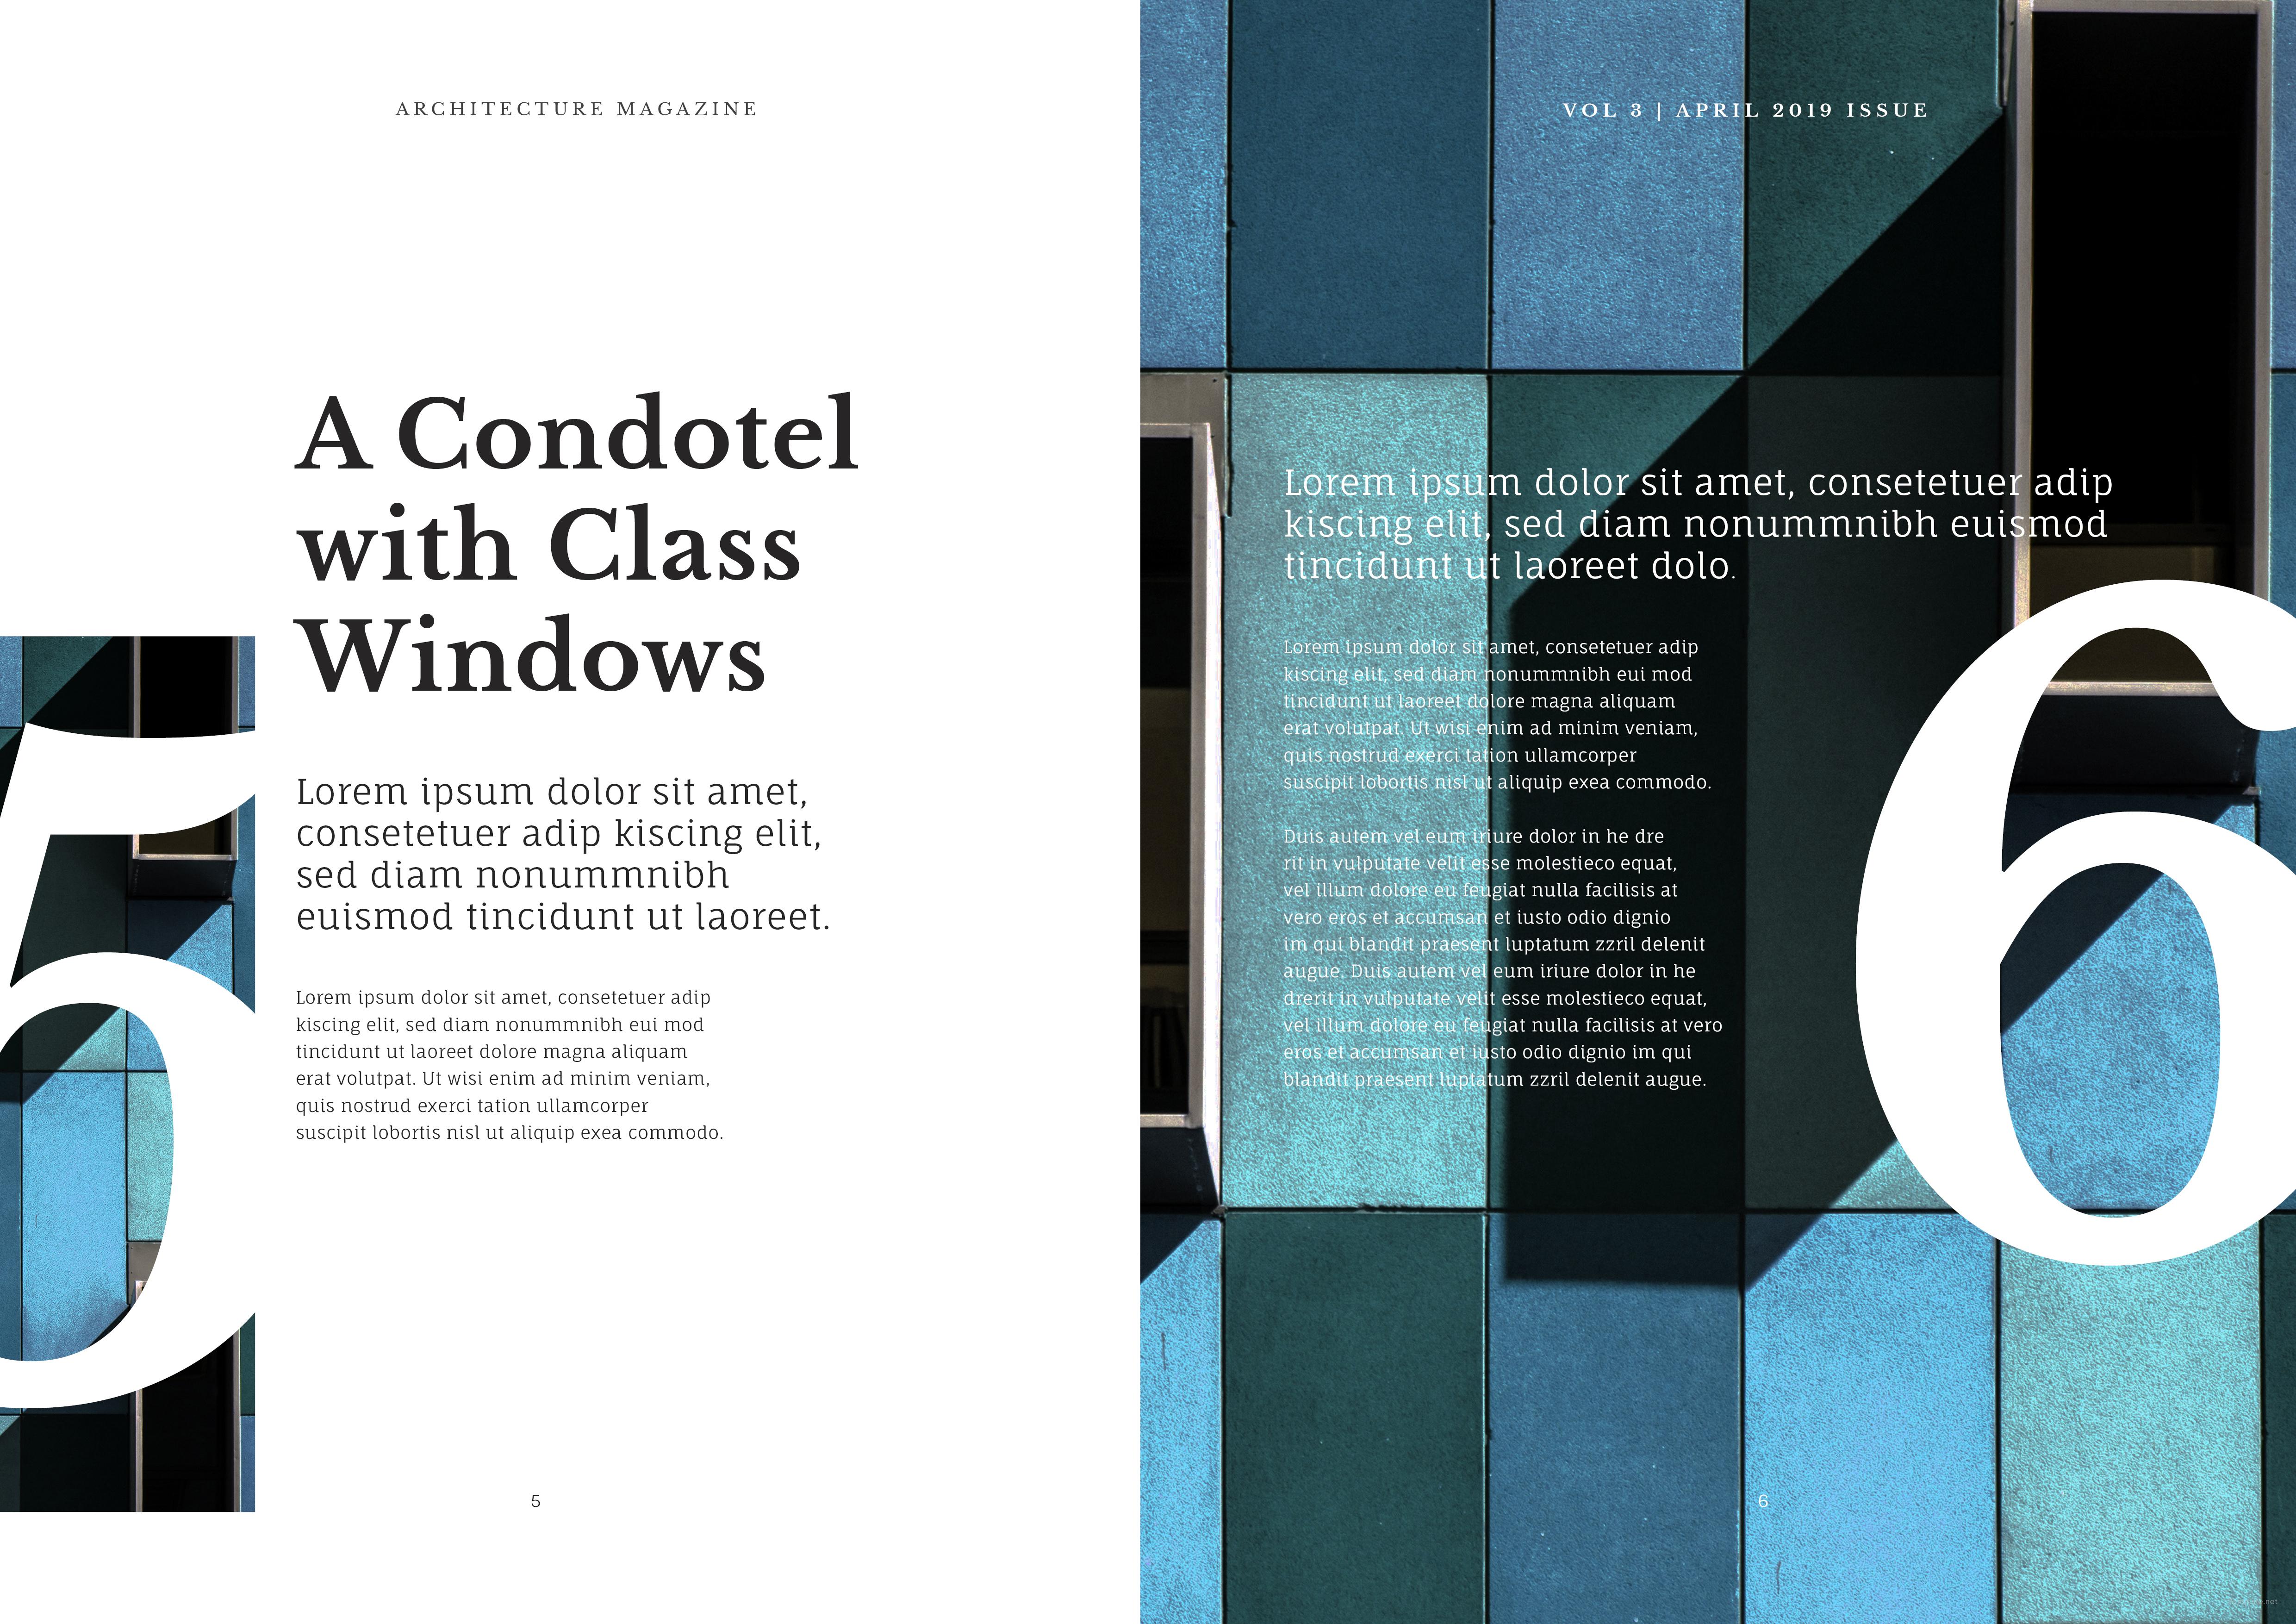 free architecture magazine editable architecture magazine template printable architecture magazine template customize architecture magazine template - Free Architecture Magazines